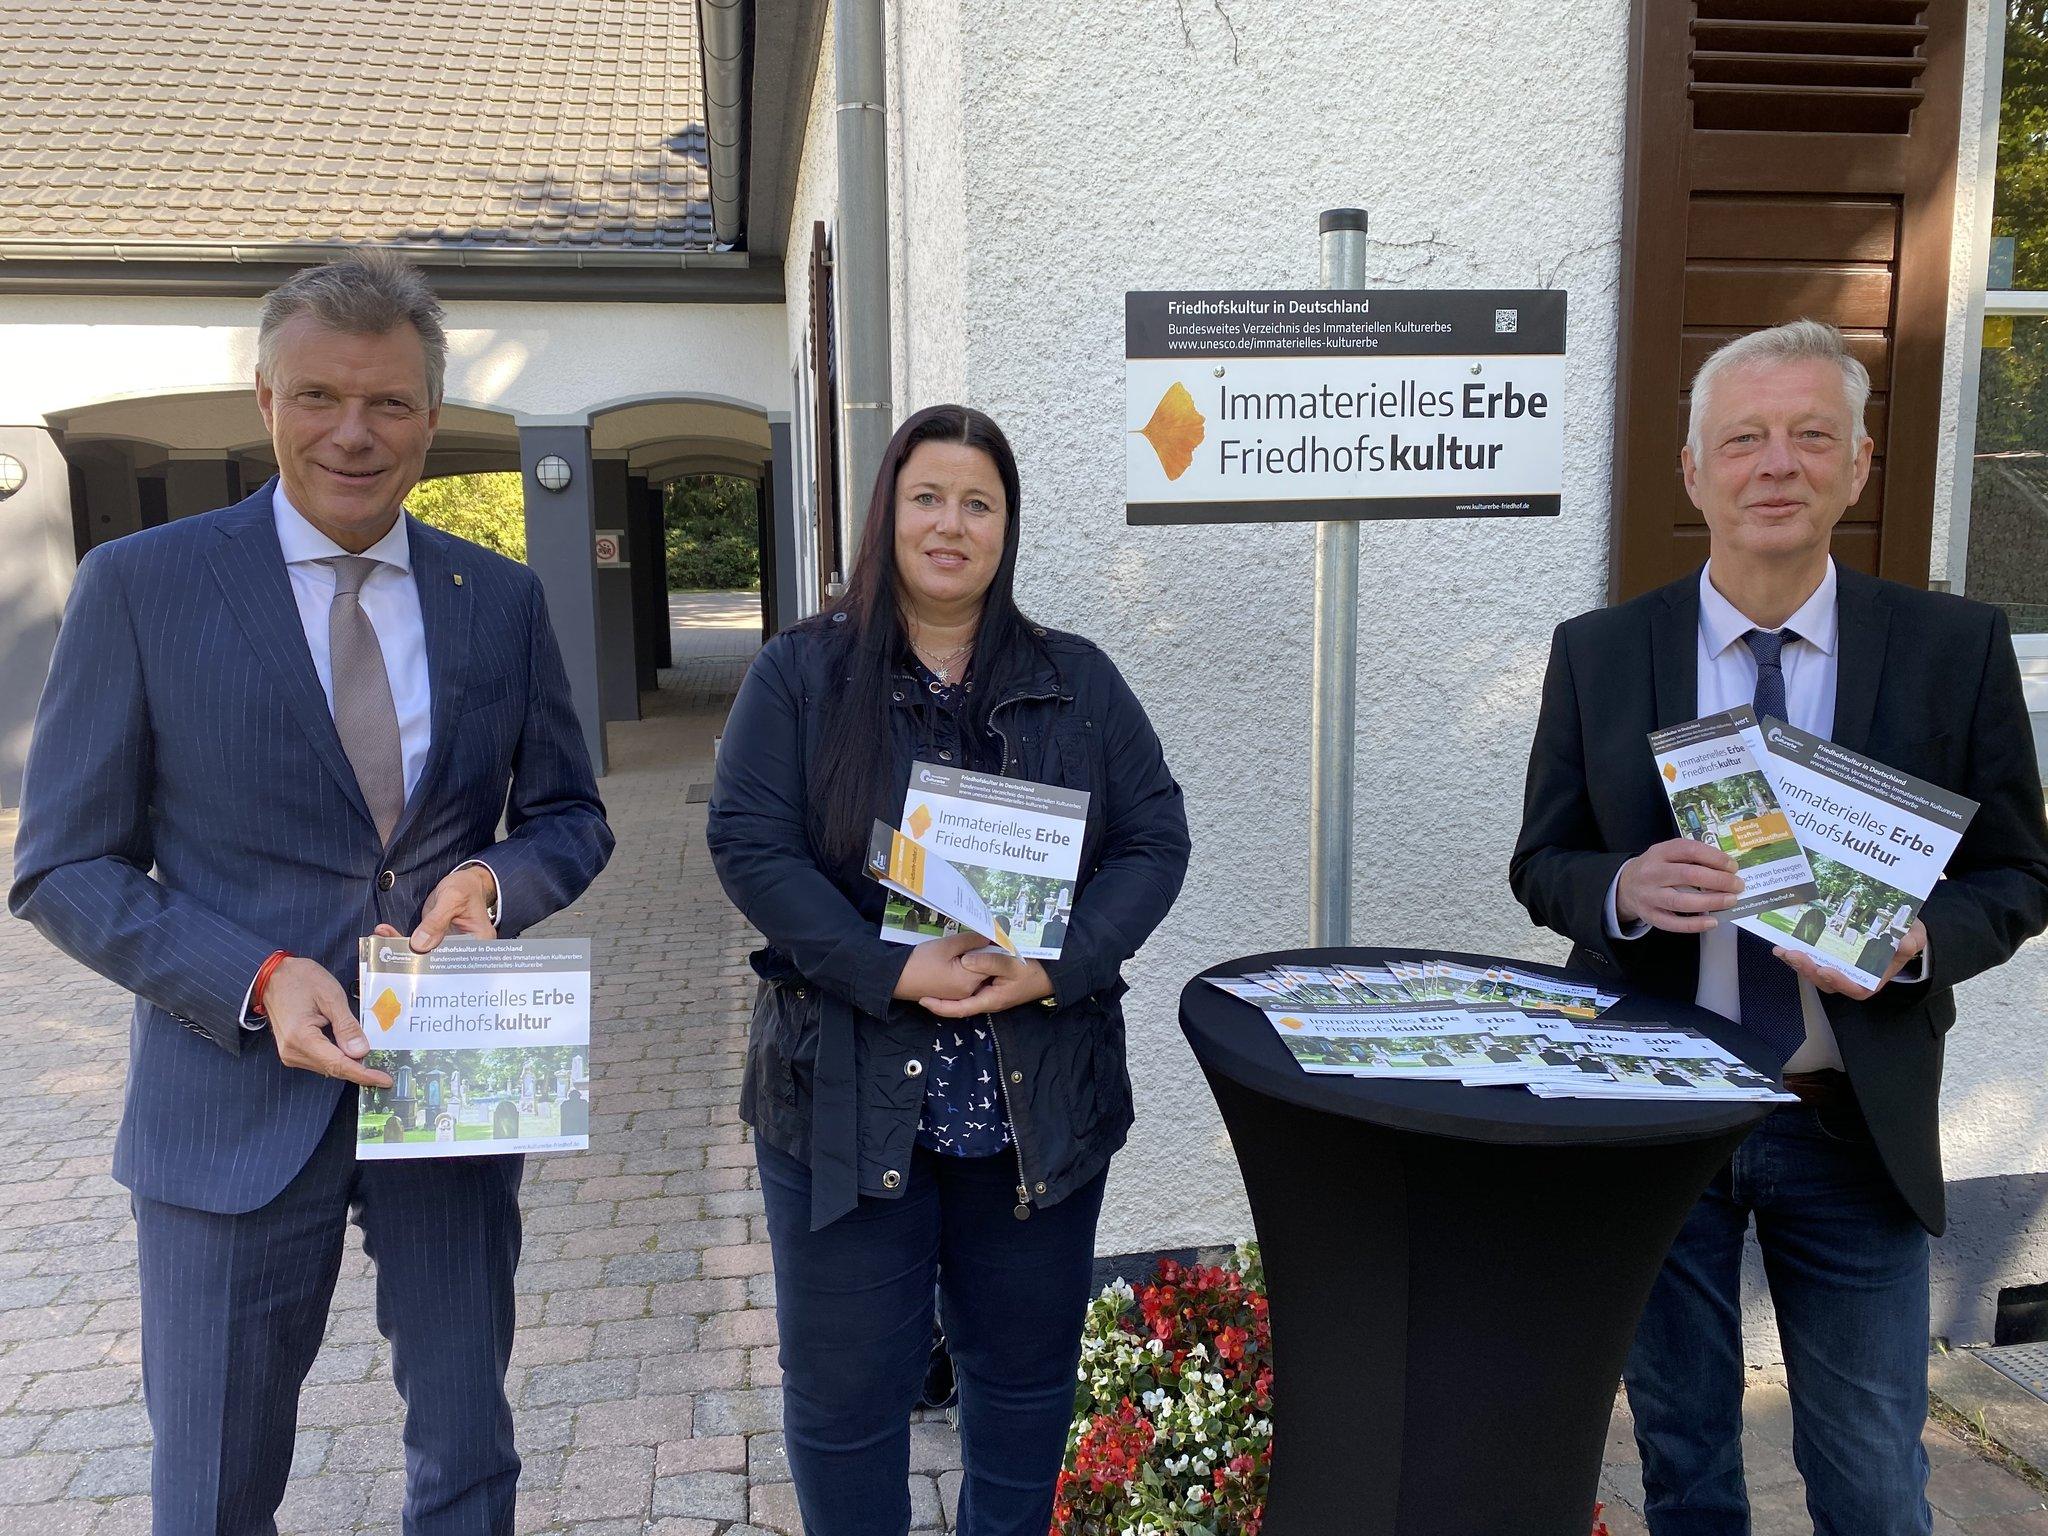 Stadt Recklinghausen: Ort der Begegnung - Recklinghausen